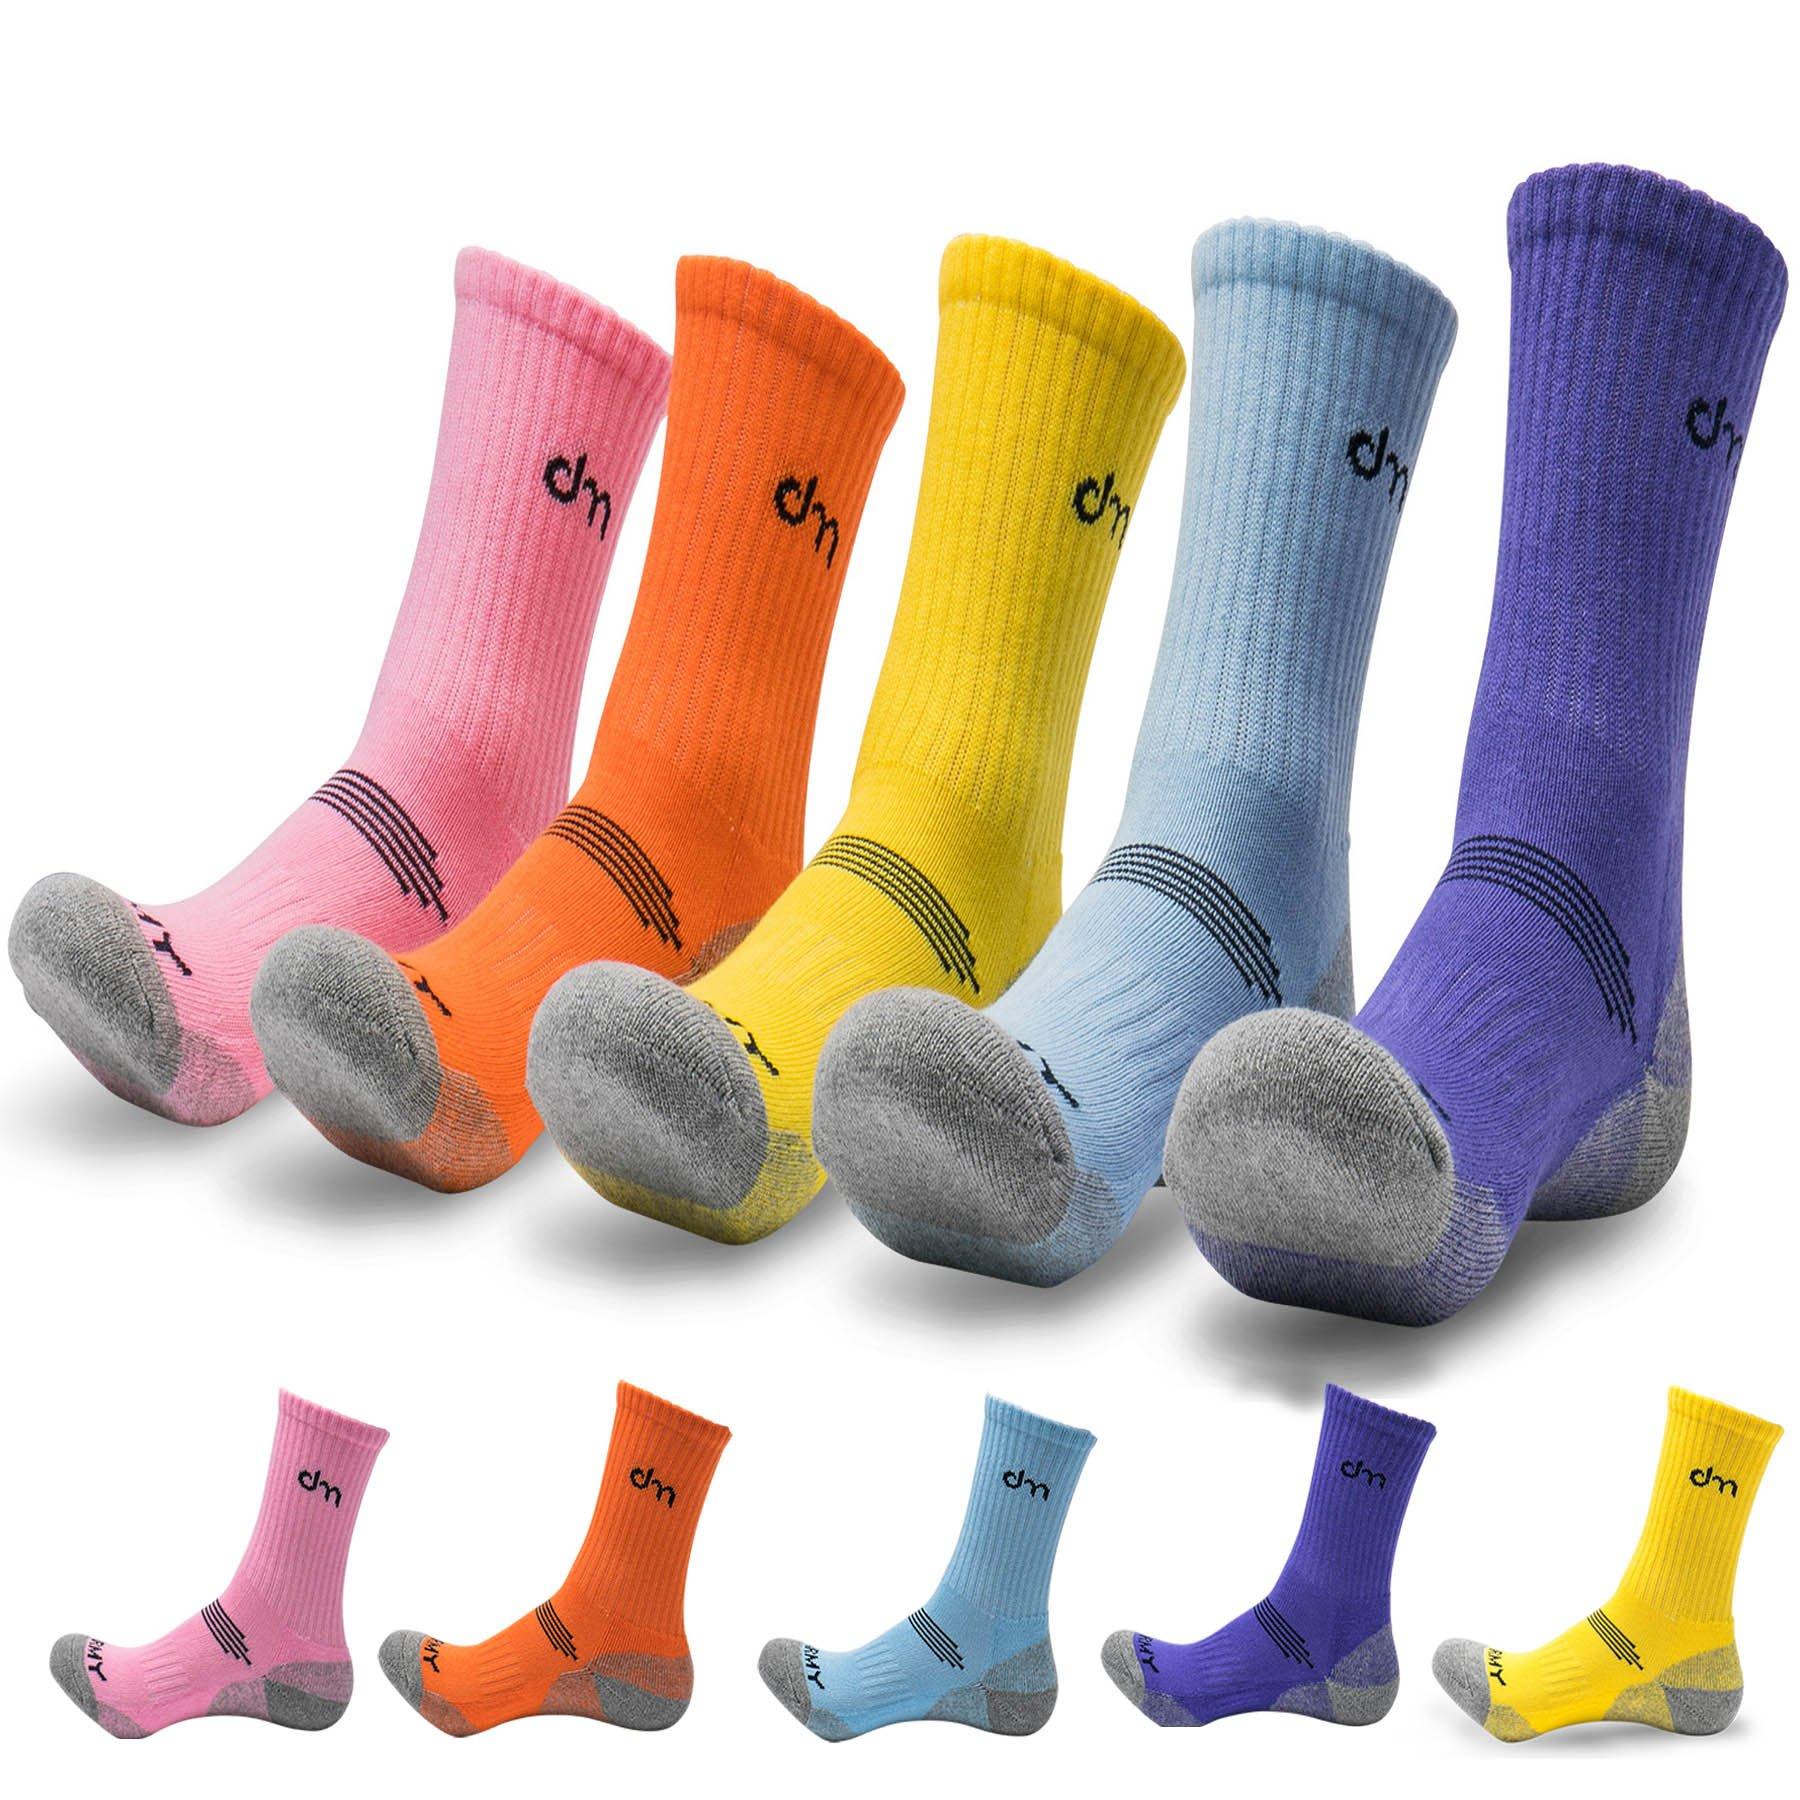 5Pack of Women's Multi Performance Cushion Outdoor Hiking Crew Socks | Mountain Biking,Trekking | Moisture Wicking | Year Round (Small (Shoe size 6-8 US), 5 Pack- Orange/Yellow/Purple/Sky Blue/Pink)